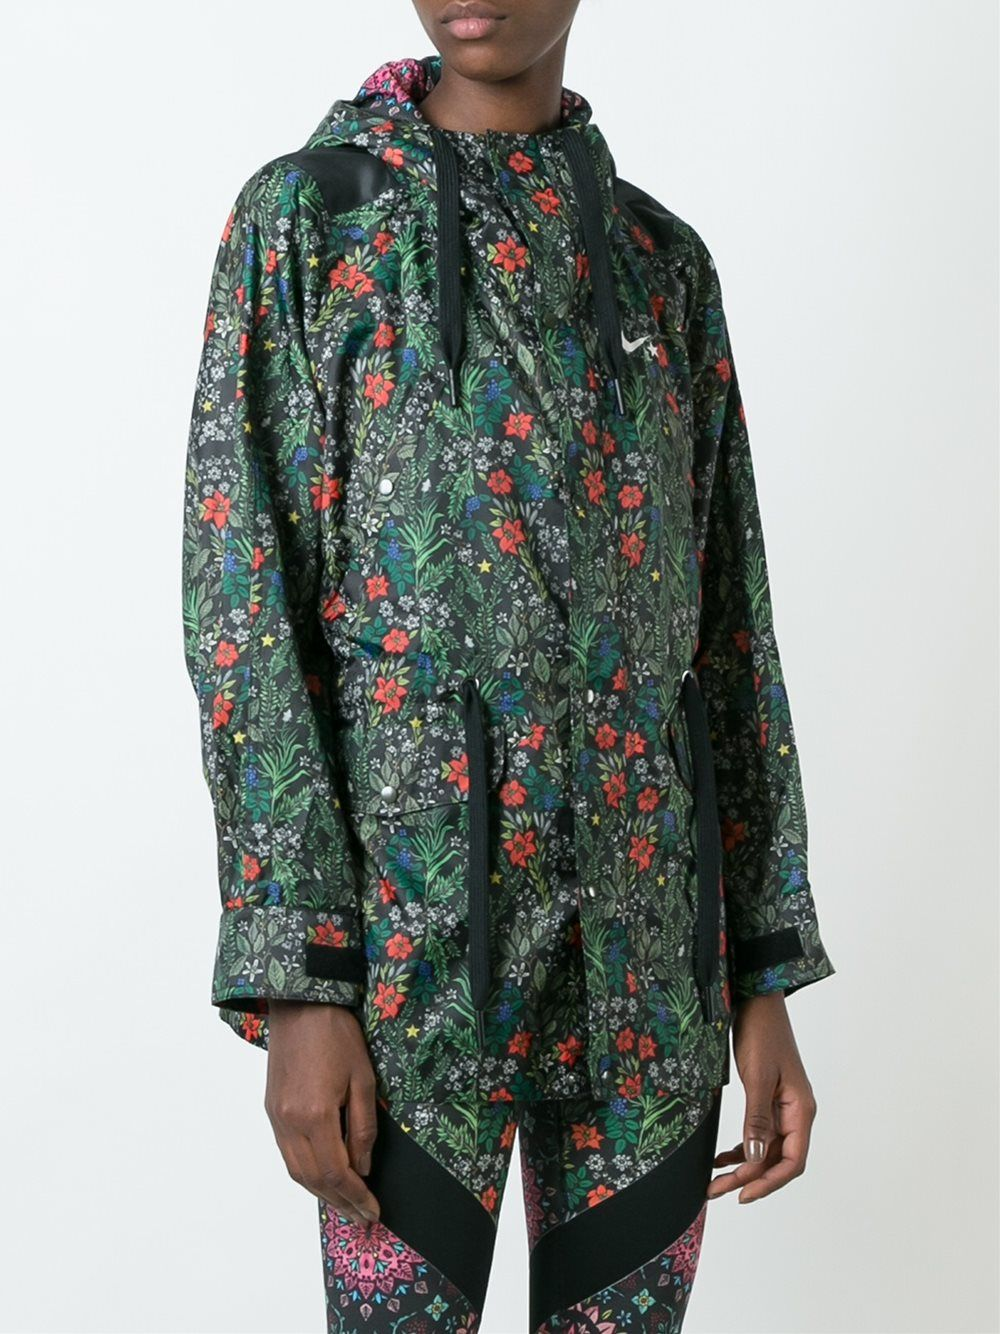 Nike NikeLab x RT floral jacket  73849b0ce